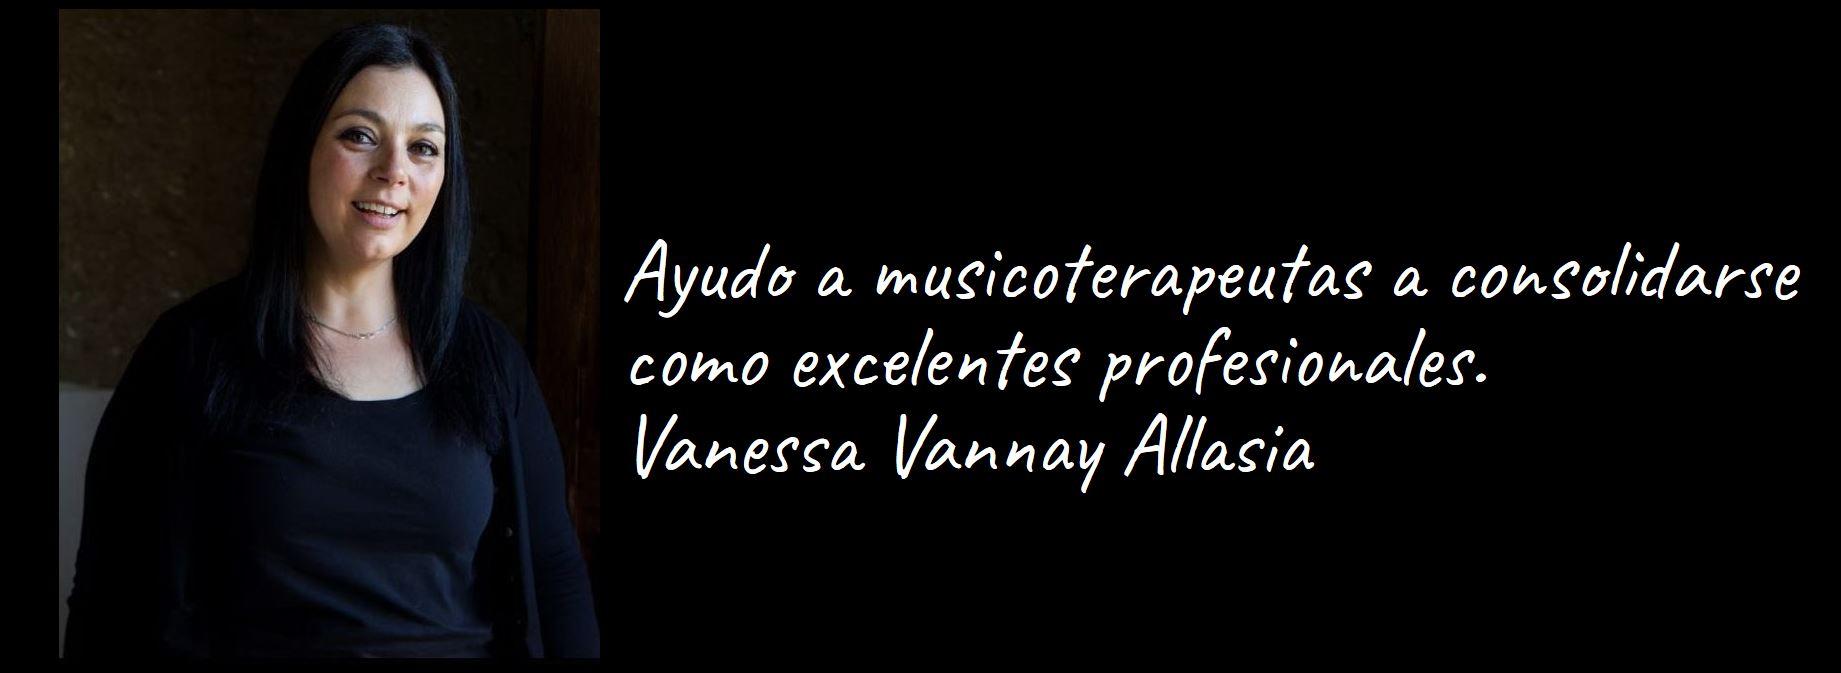 vive_de_la_musicoterapia